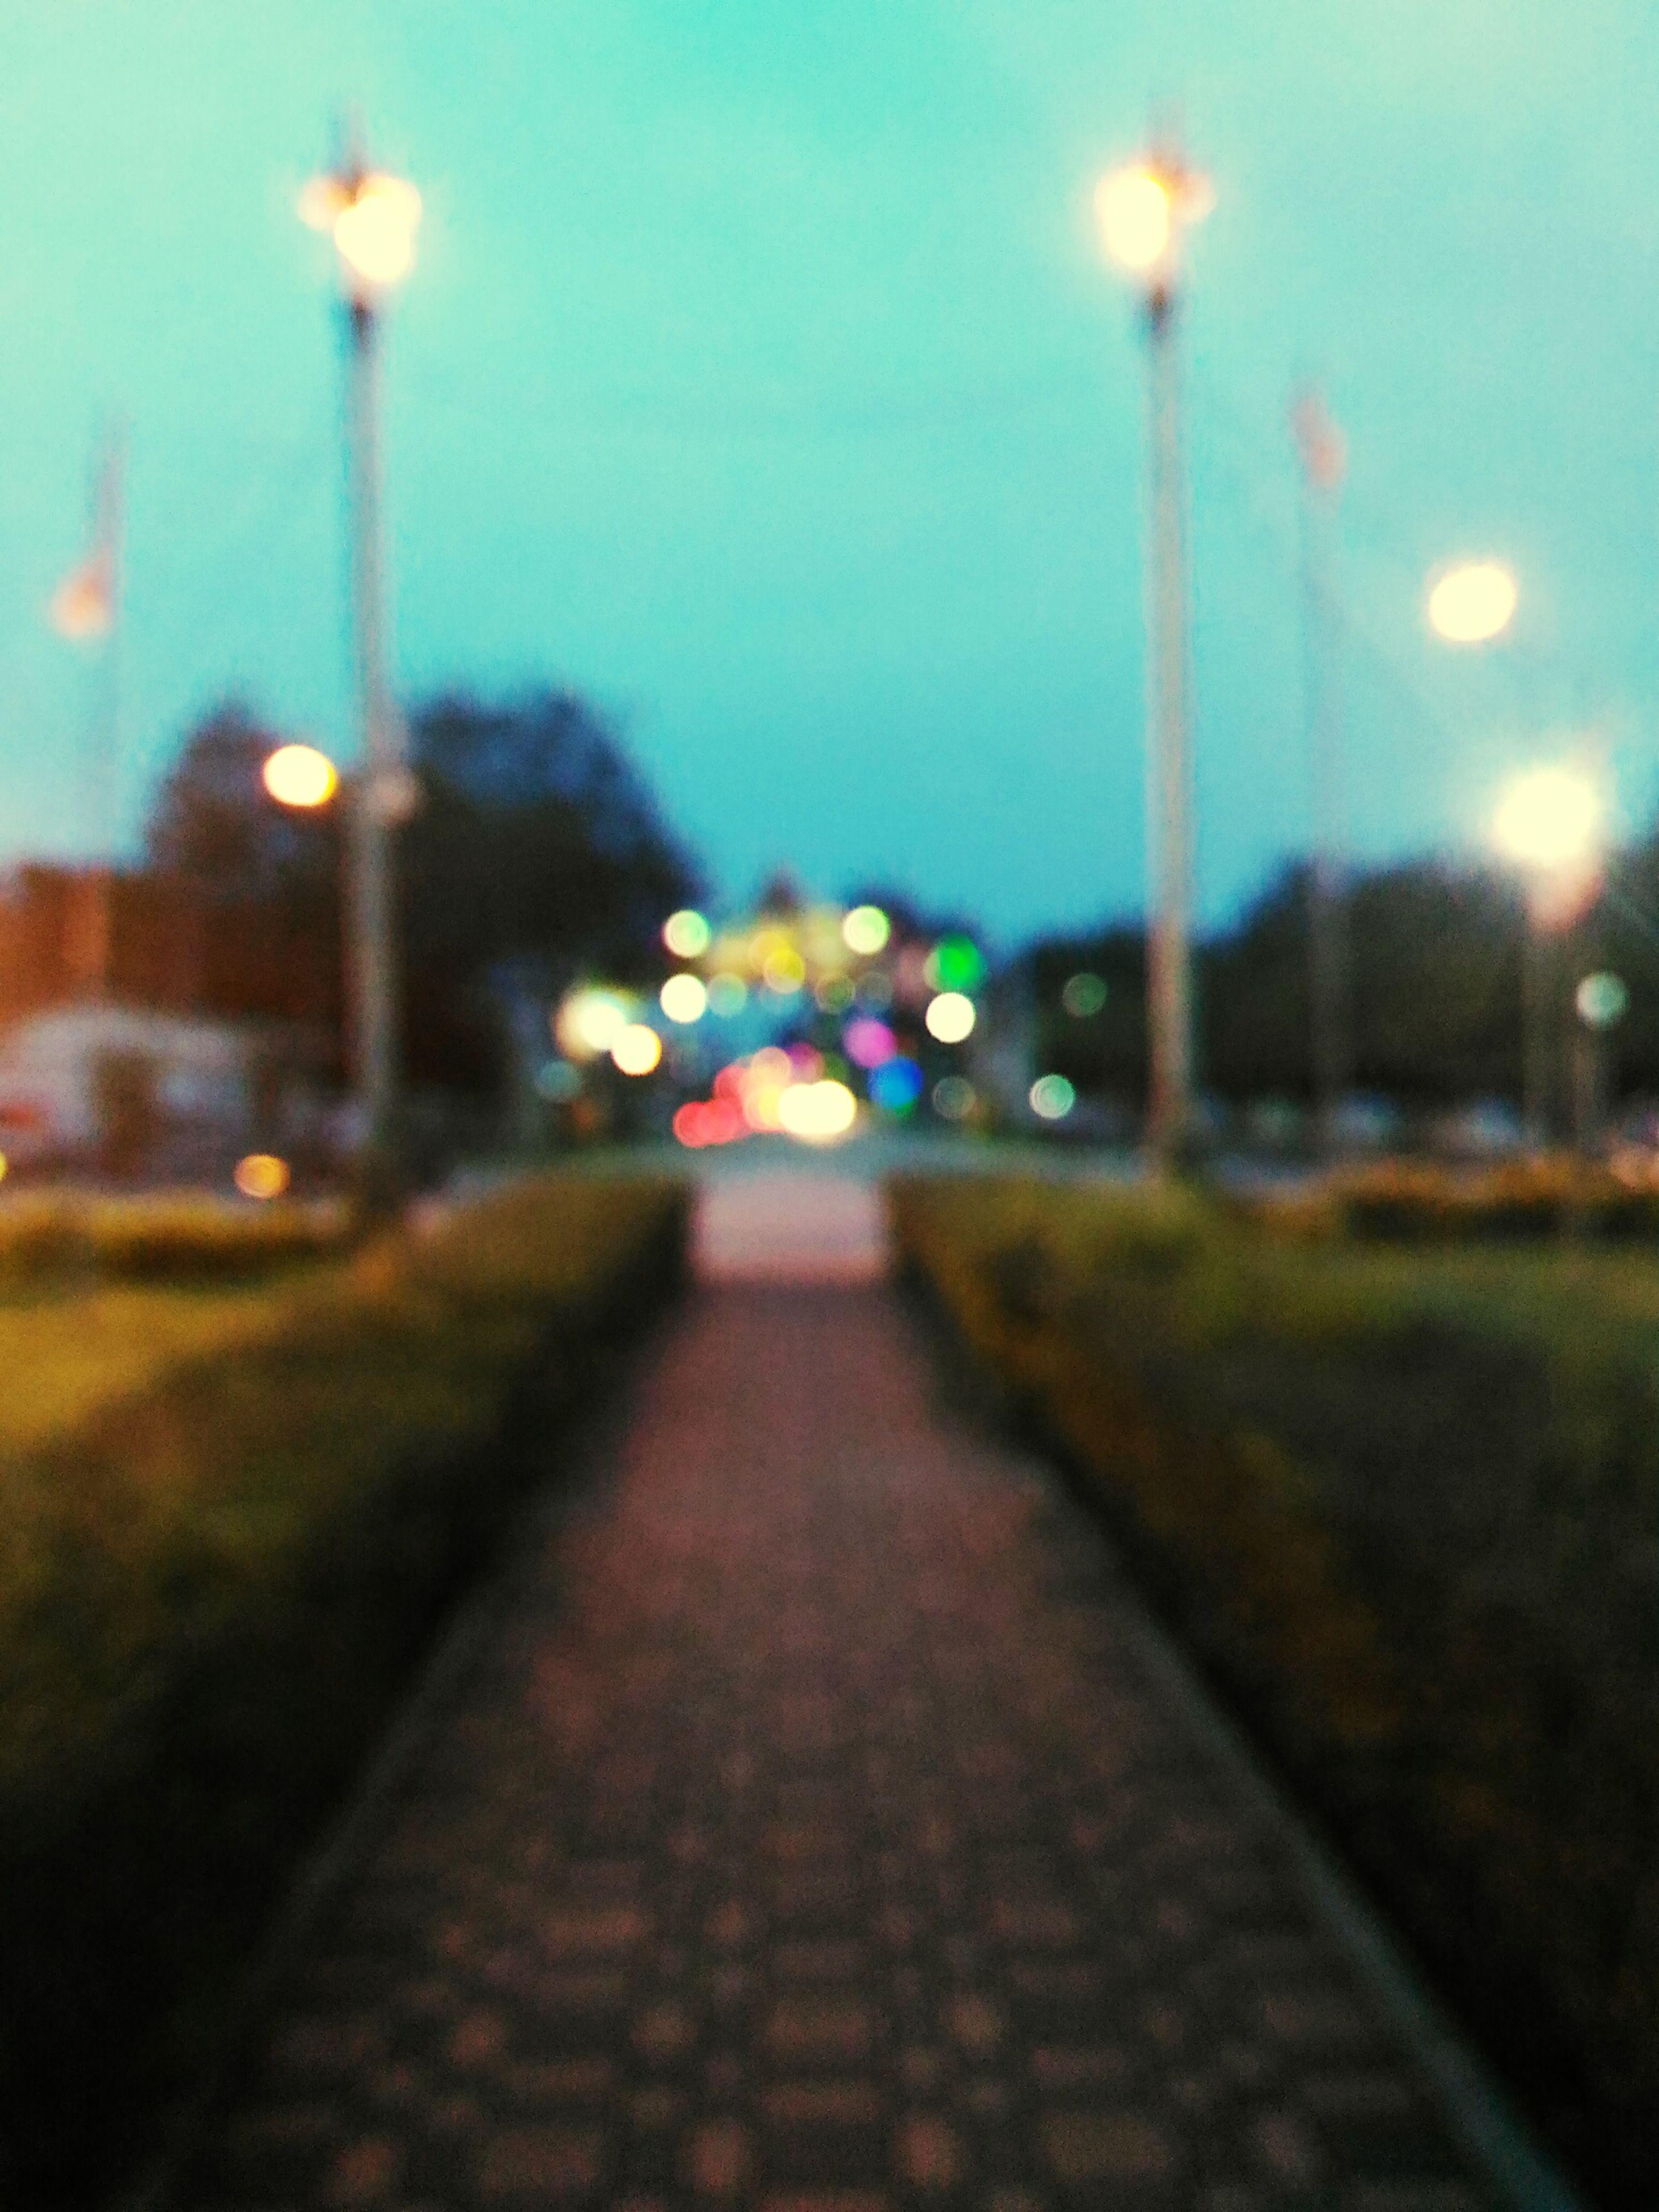 illuminated, no people, street light, the way forward, outdoors, city, night, sky, architecture